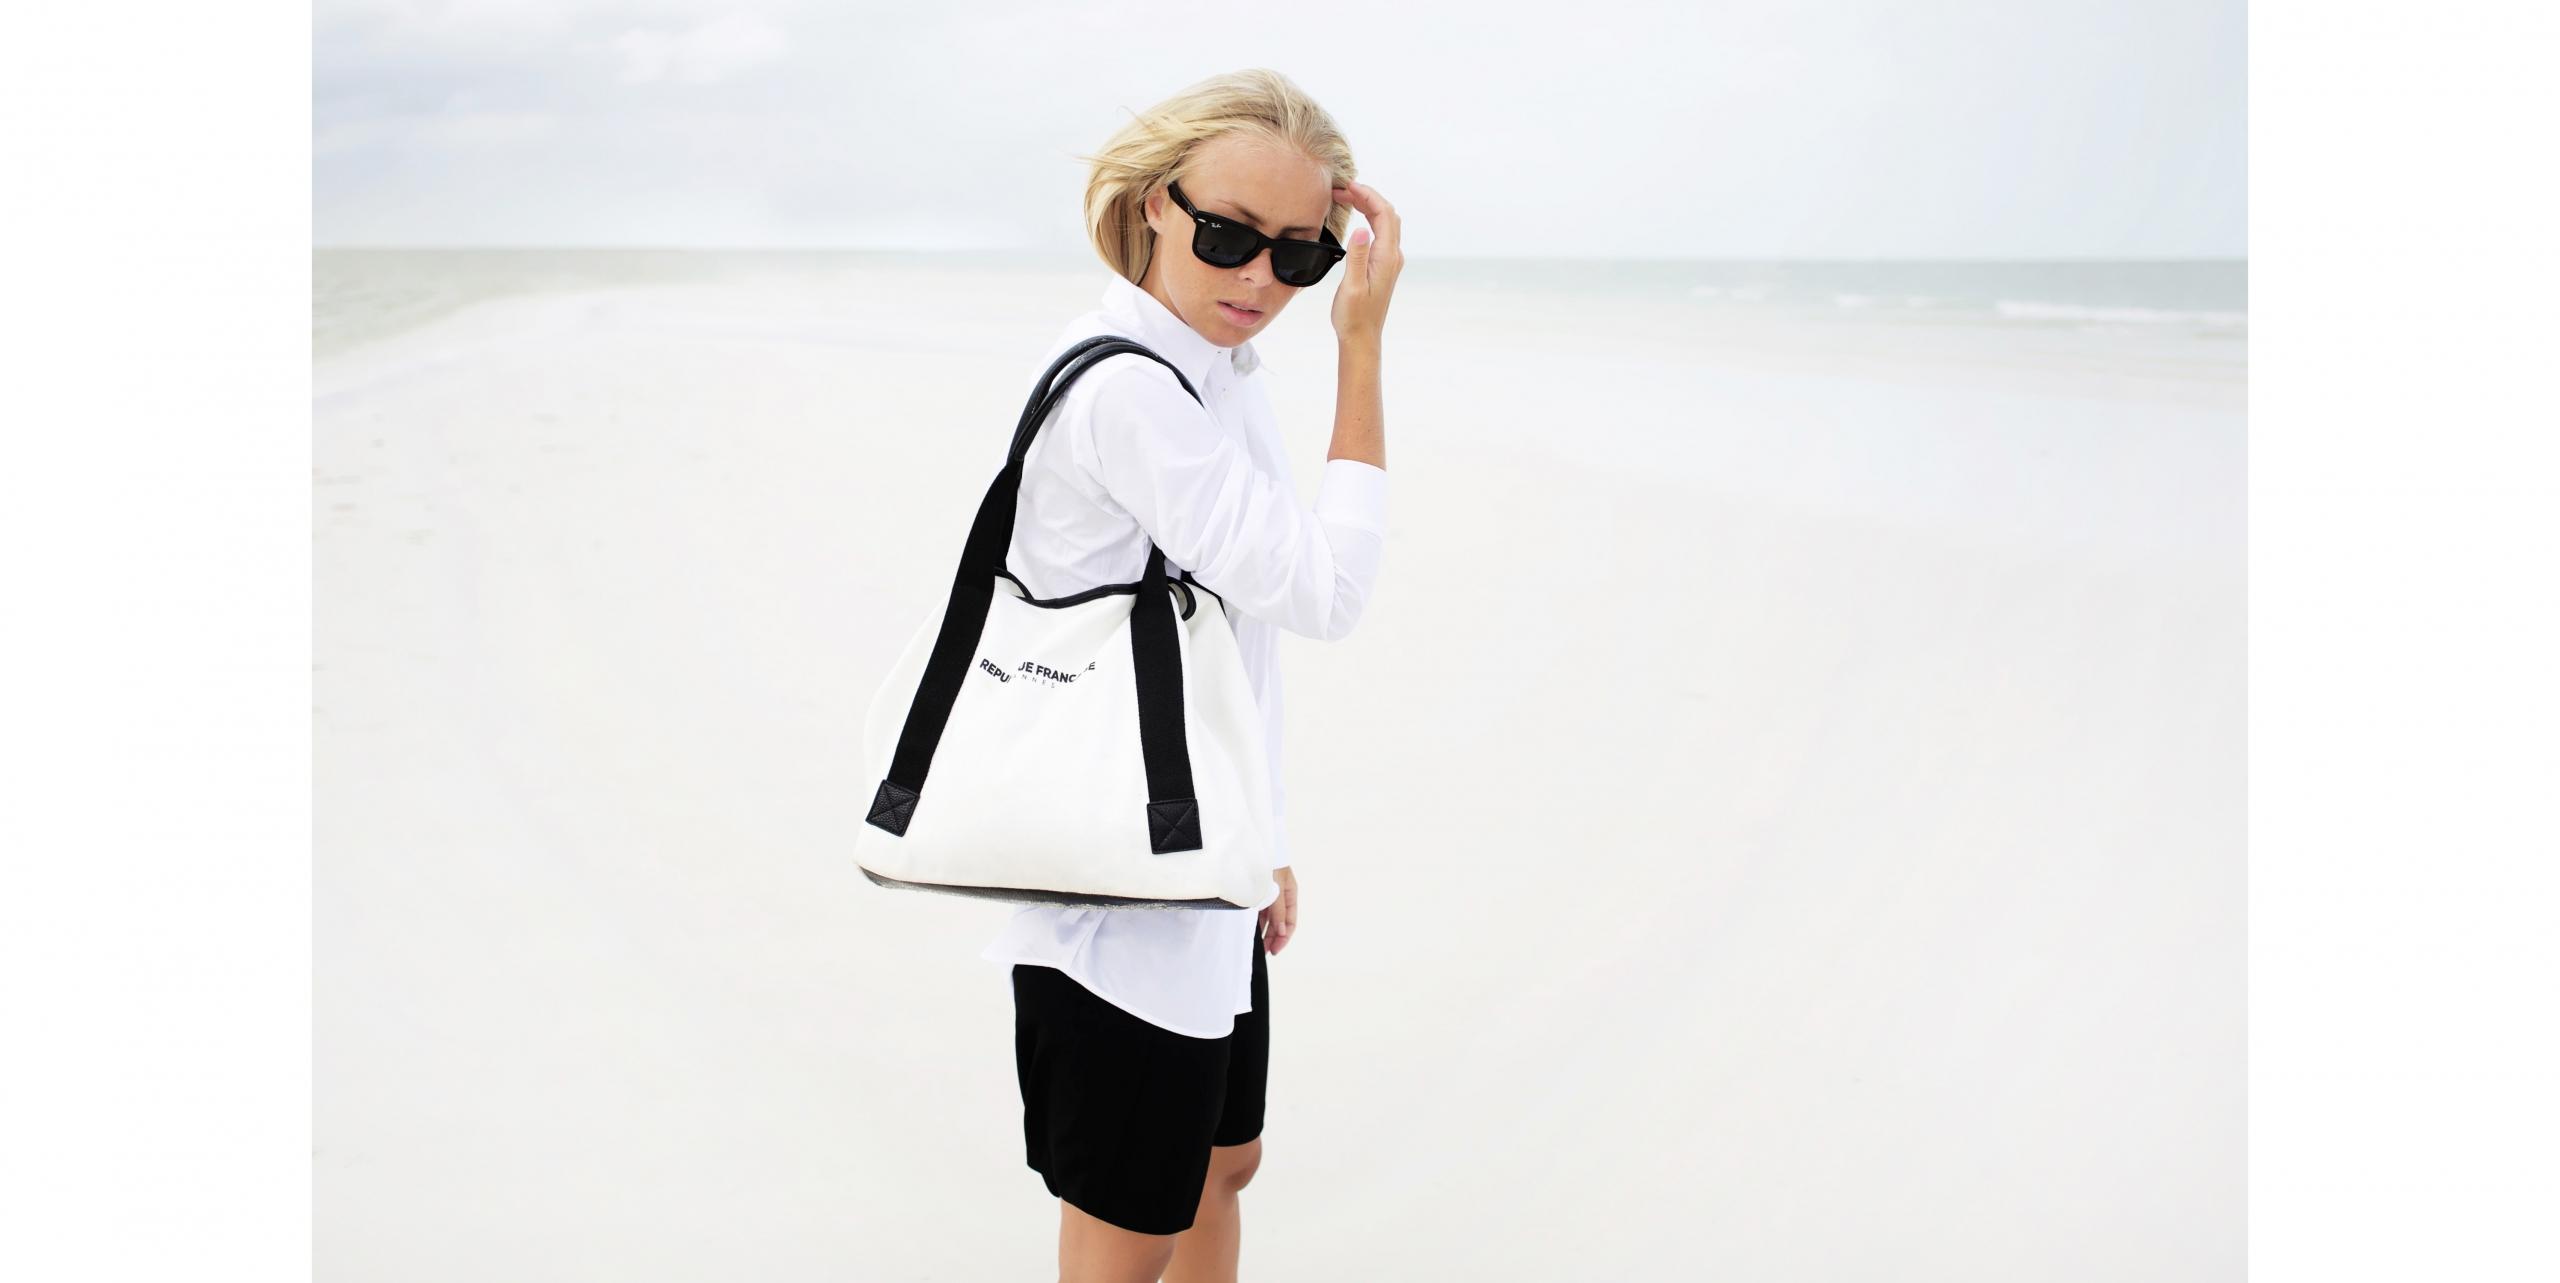 beachy3